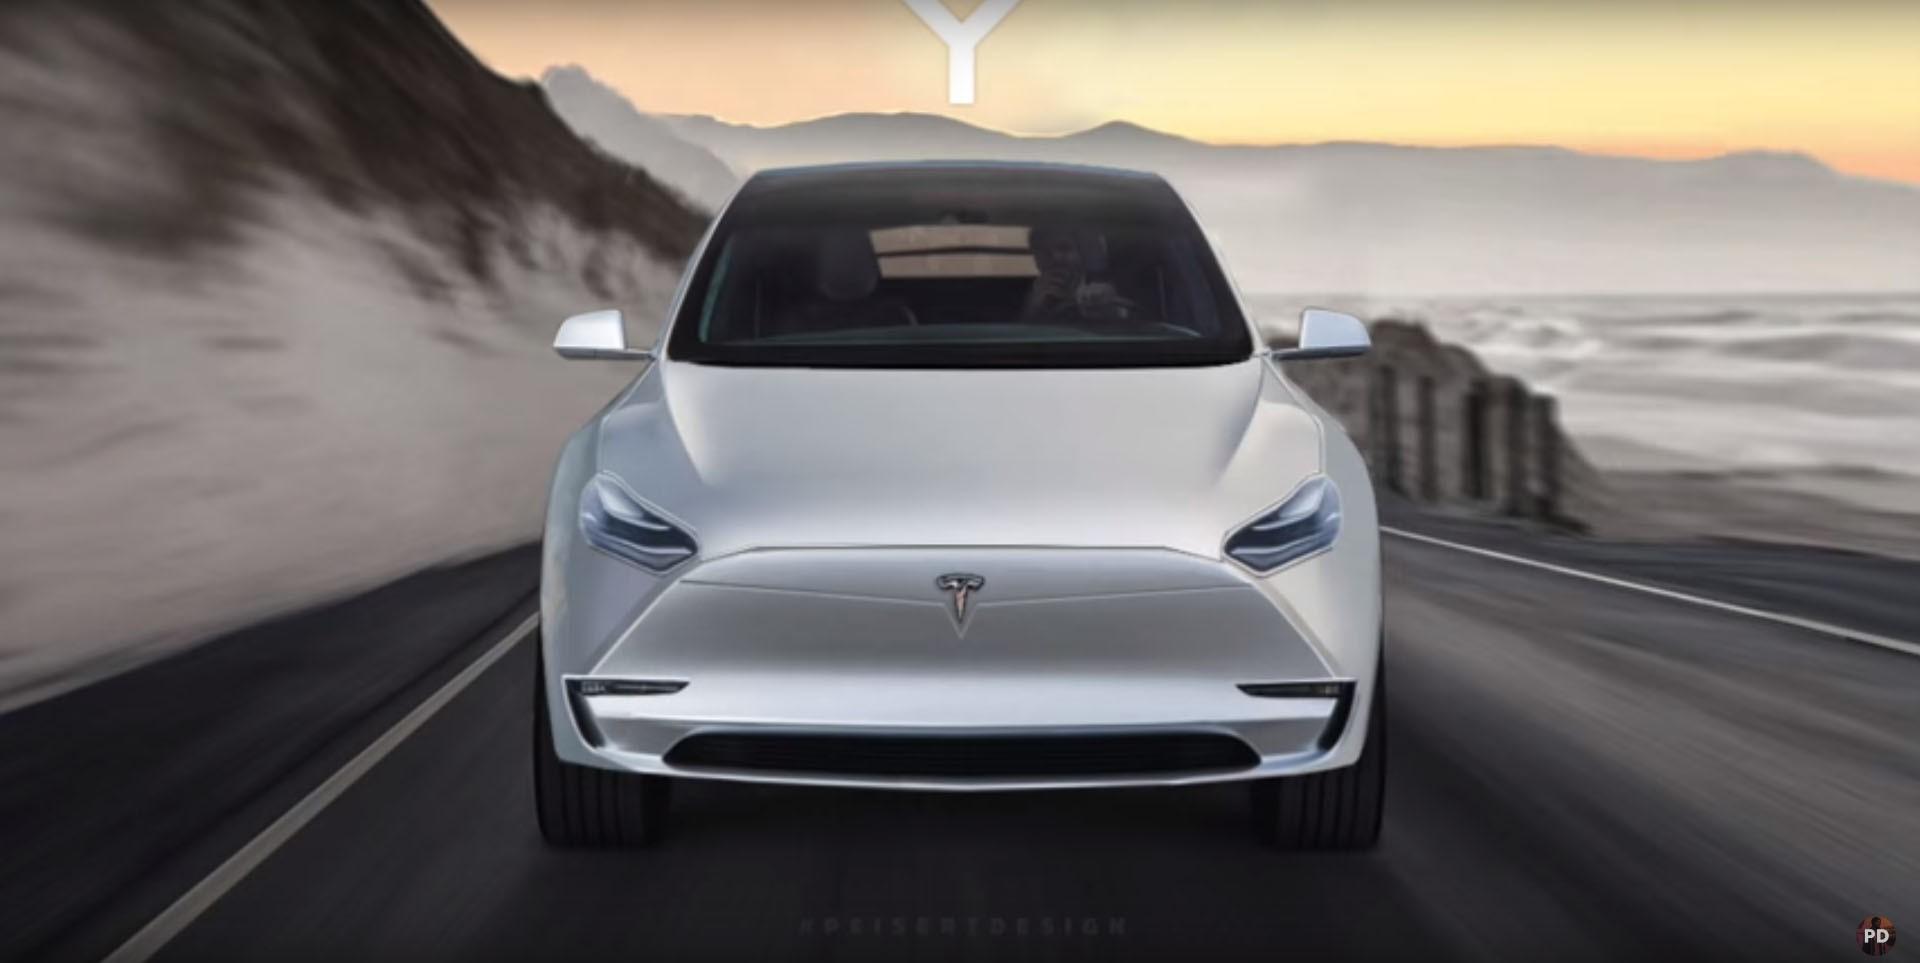 Tesla Model Y Hd: 組成S3XY產品線,Tesla Model Y將在2019問鼎SUV市場